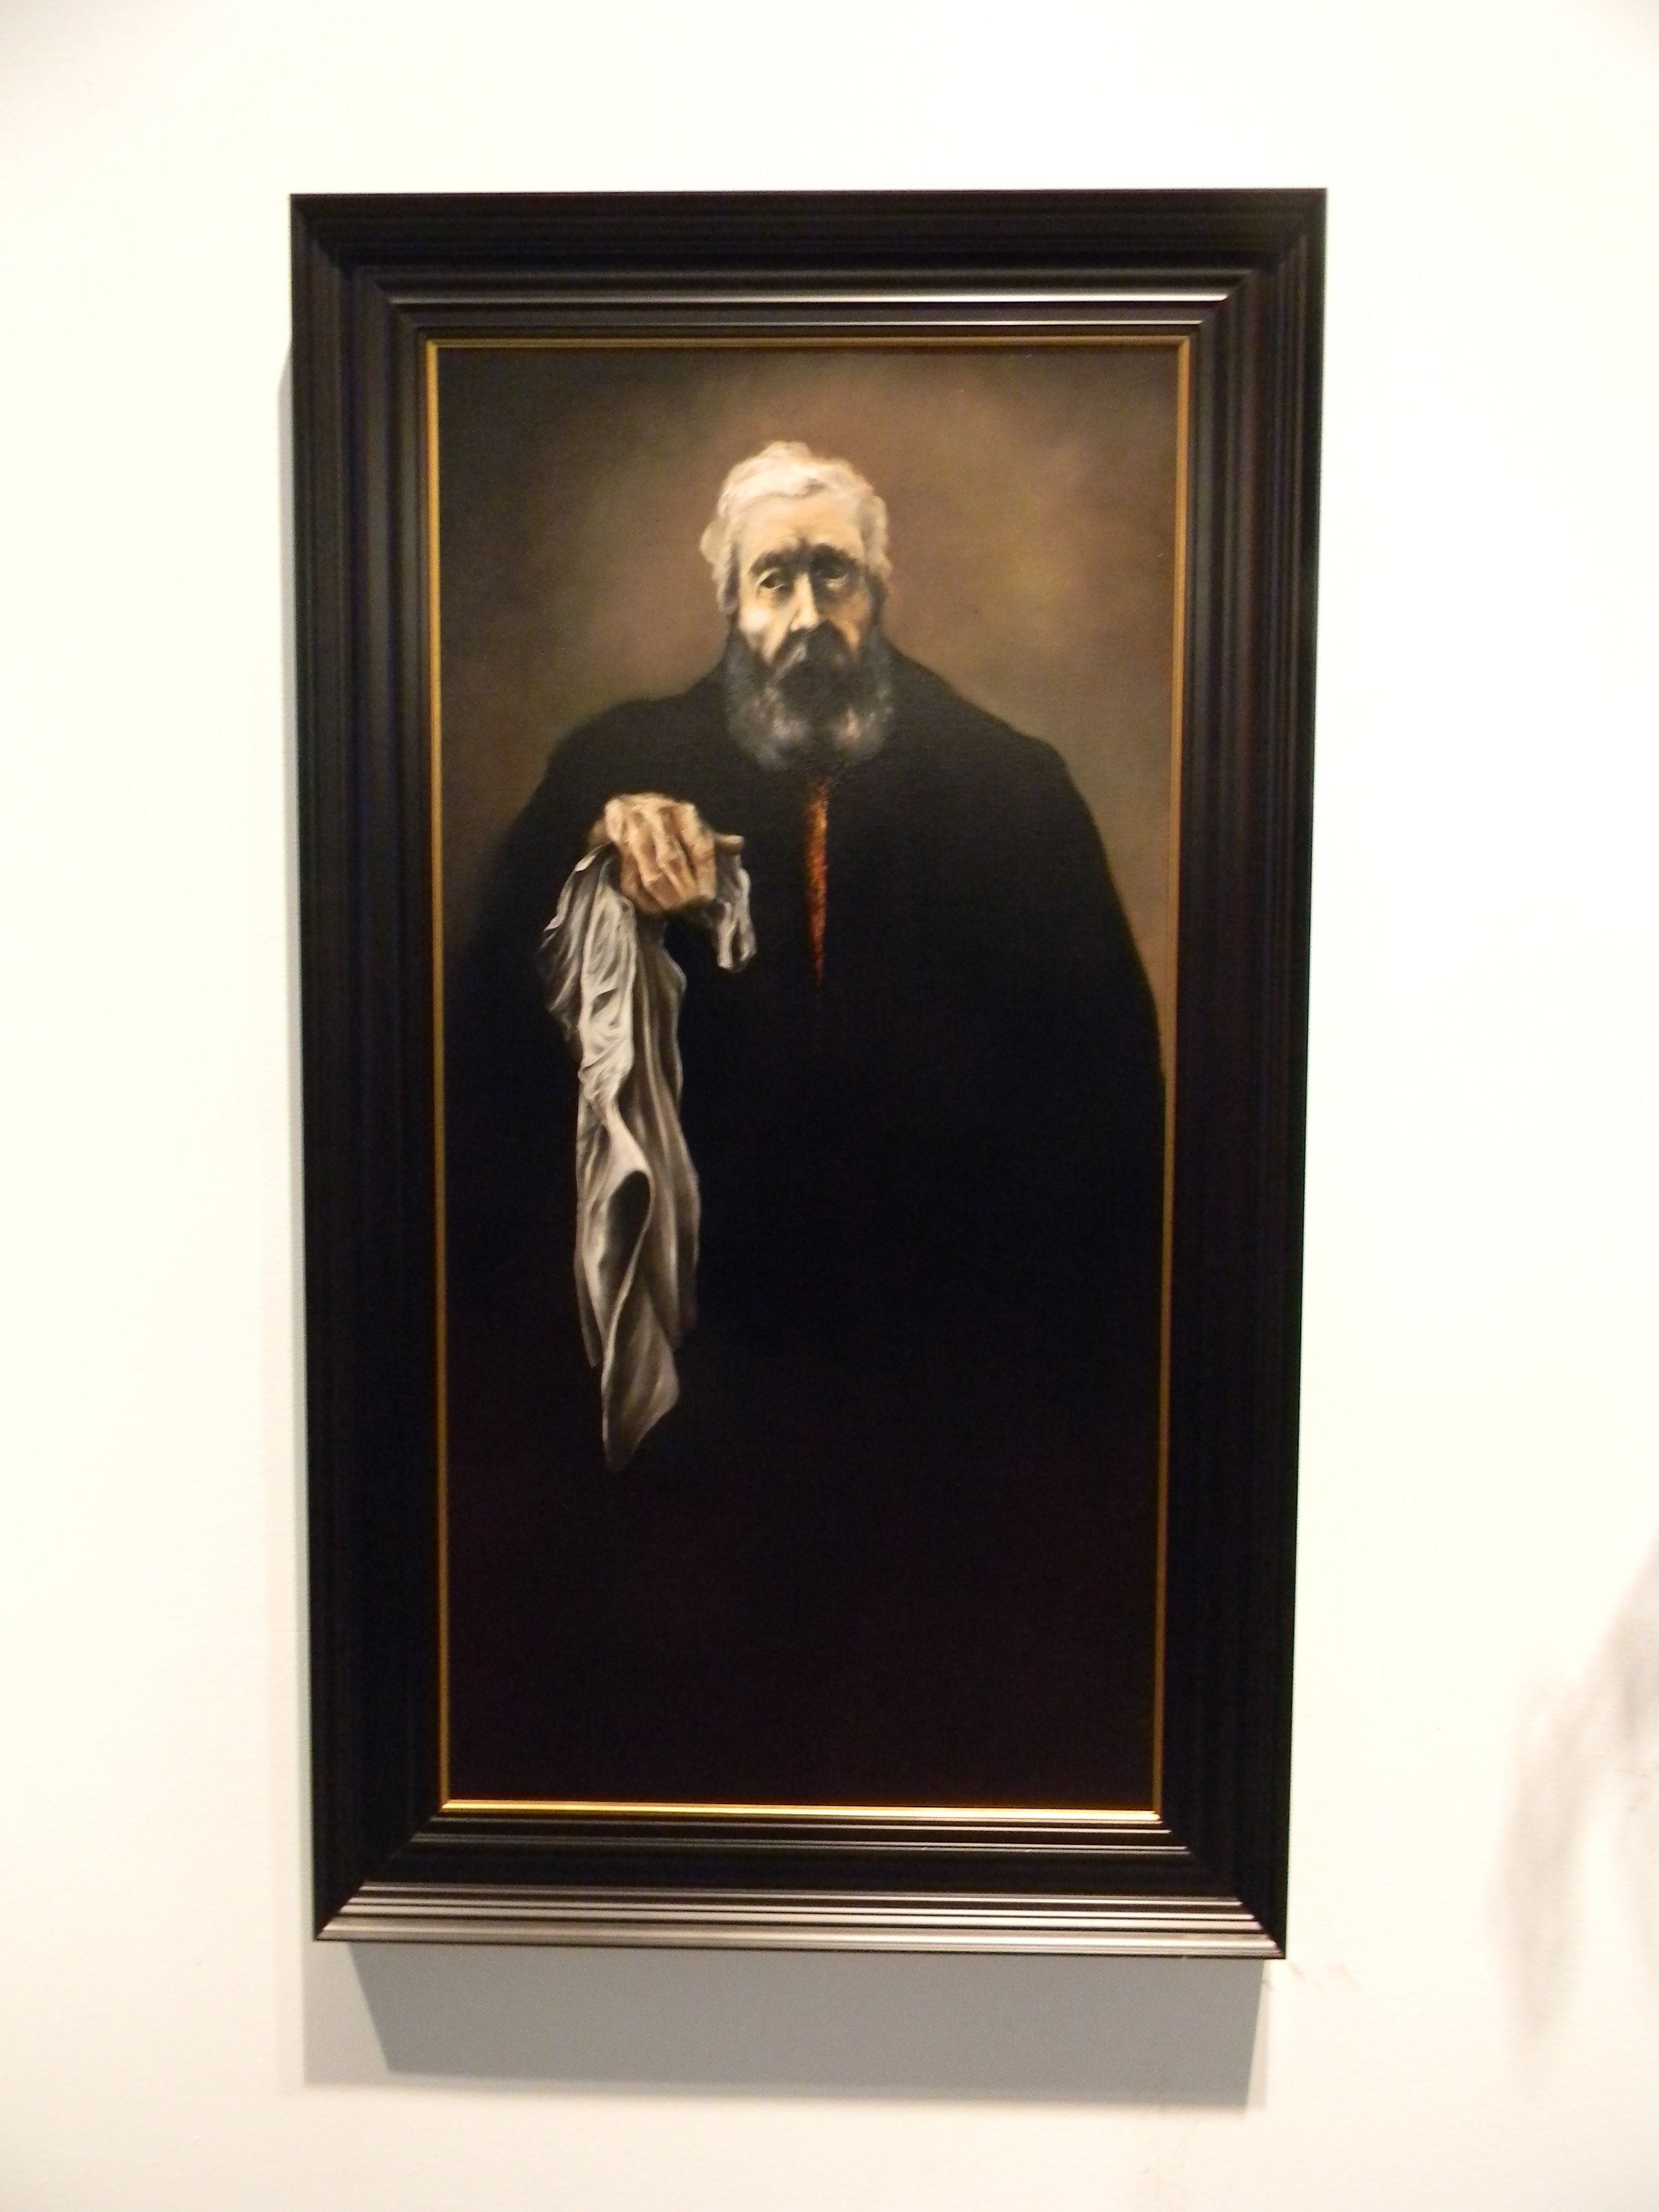 Pietro, 2016, Oil on Canvas, 48 x 24 inches